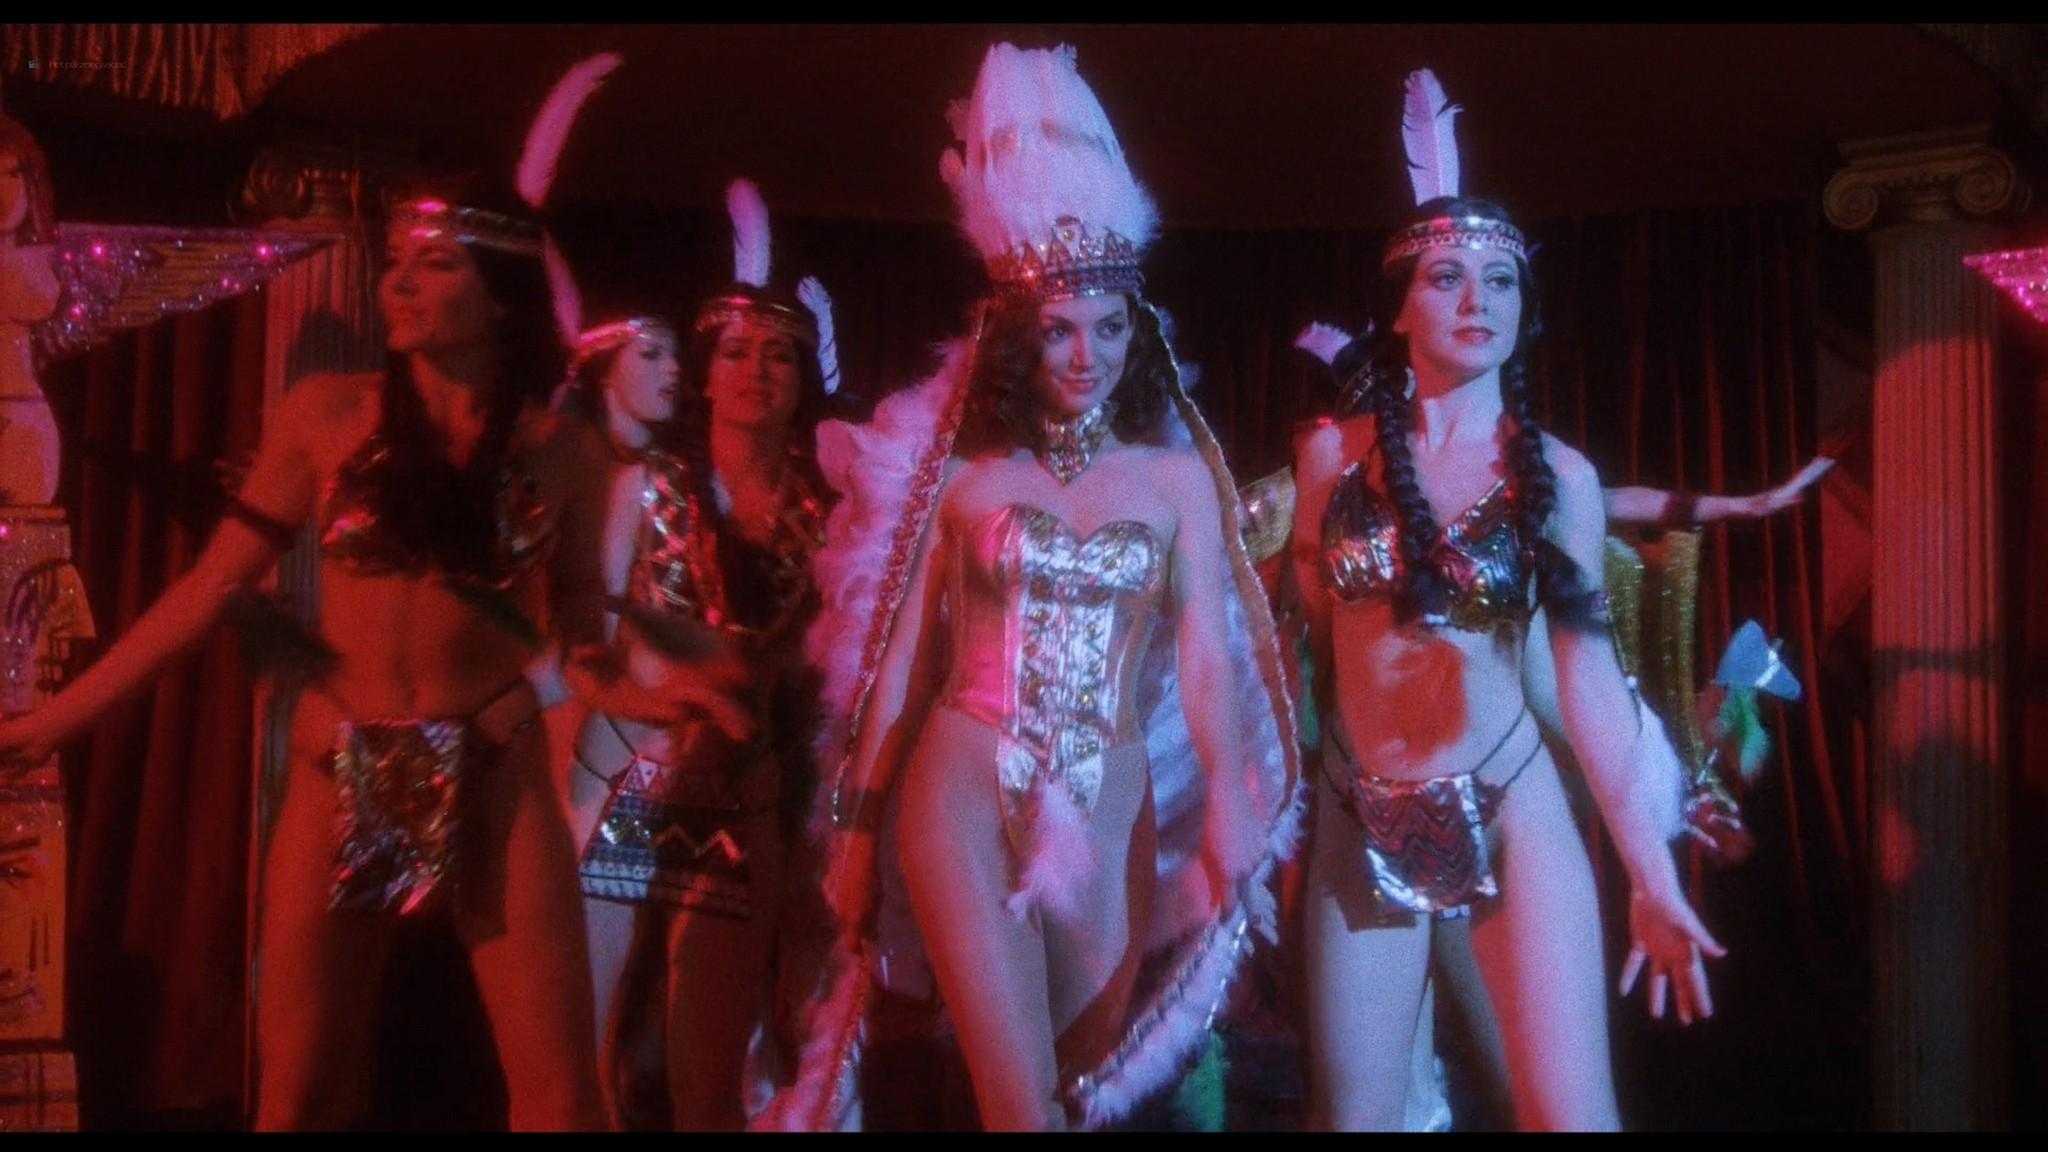 Bridget Fonda nude butt boobs Britt Ekland nude Joanne Whalley hot - Scandal (1989) HD 1080p BluRay (16)